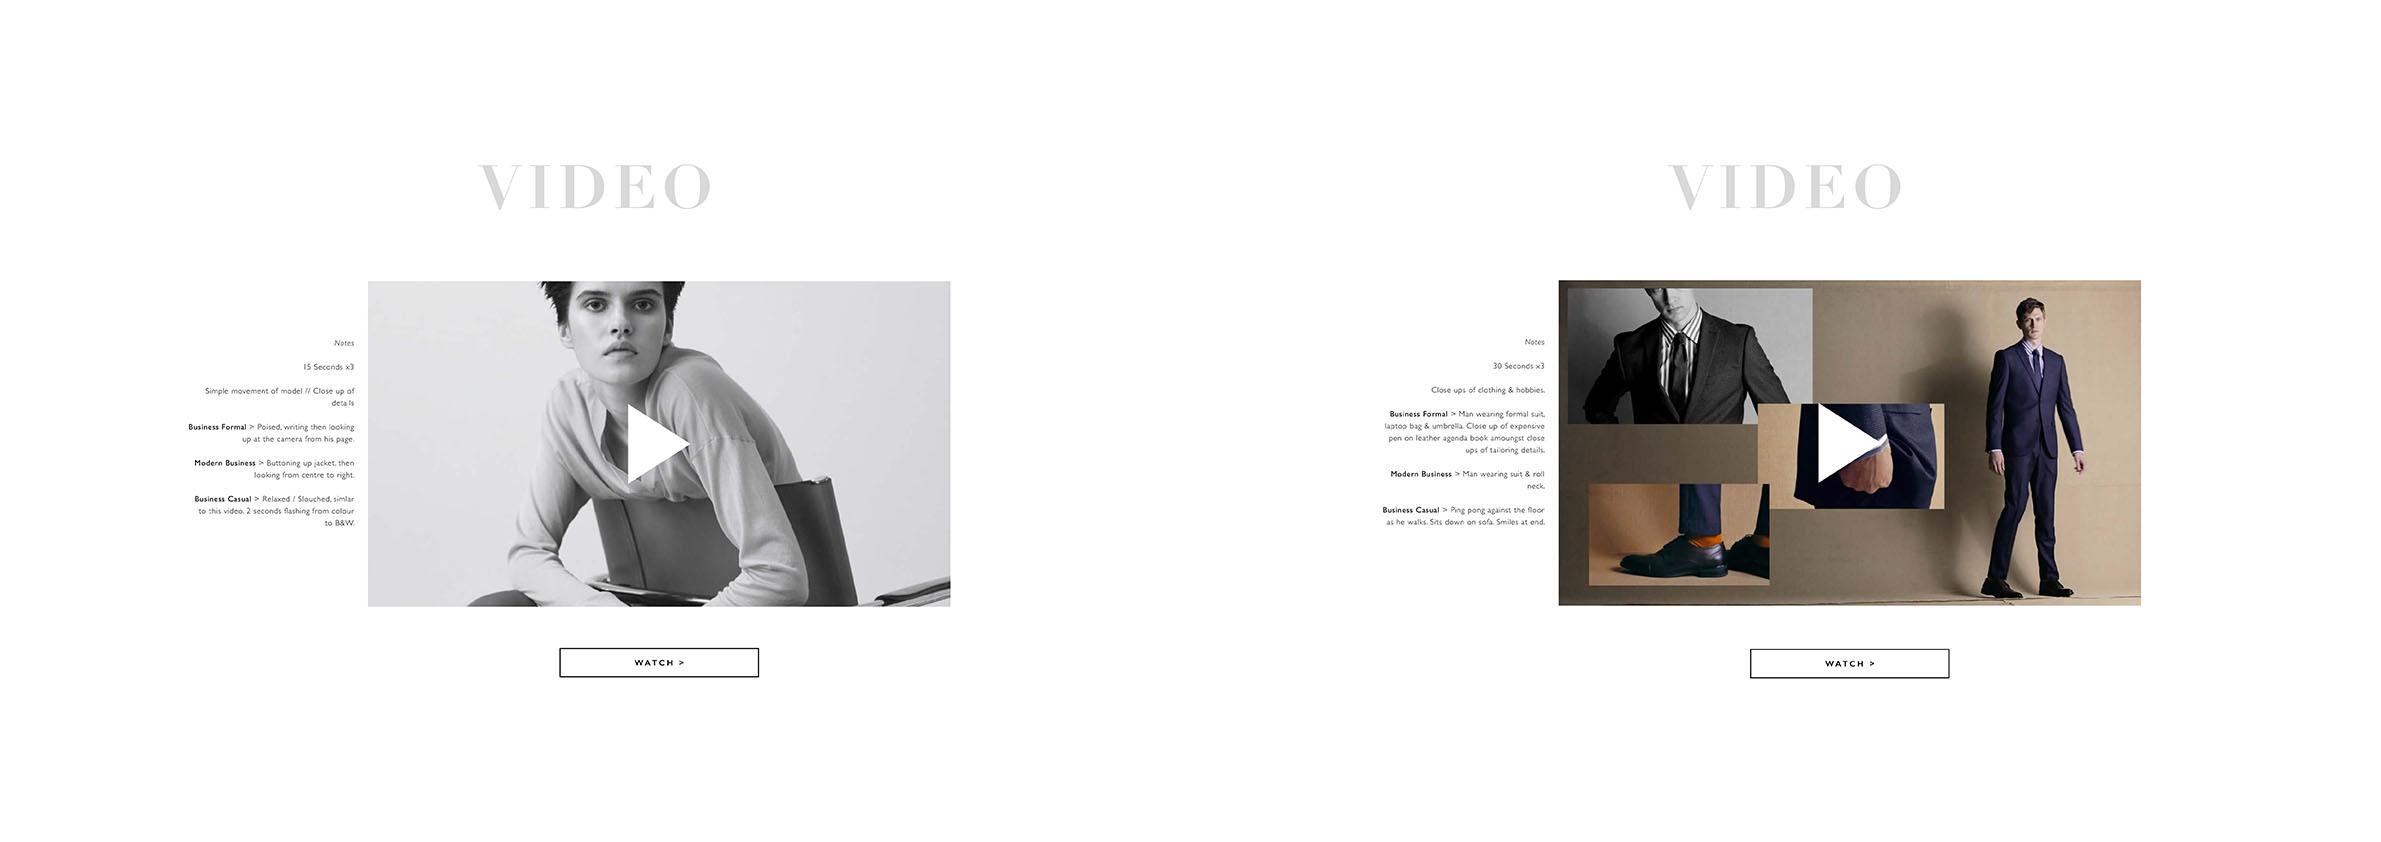 lauren-grace-design-freelance-london-art-direction-fashion-menswear-4.jpg